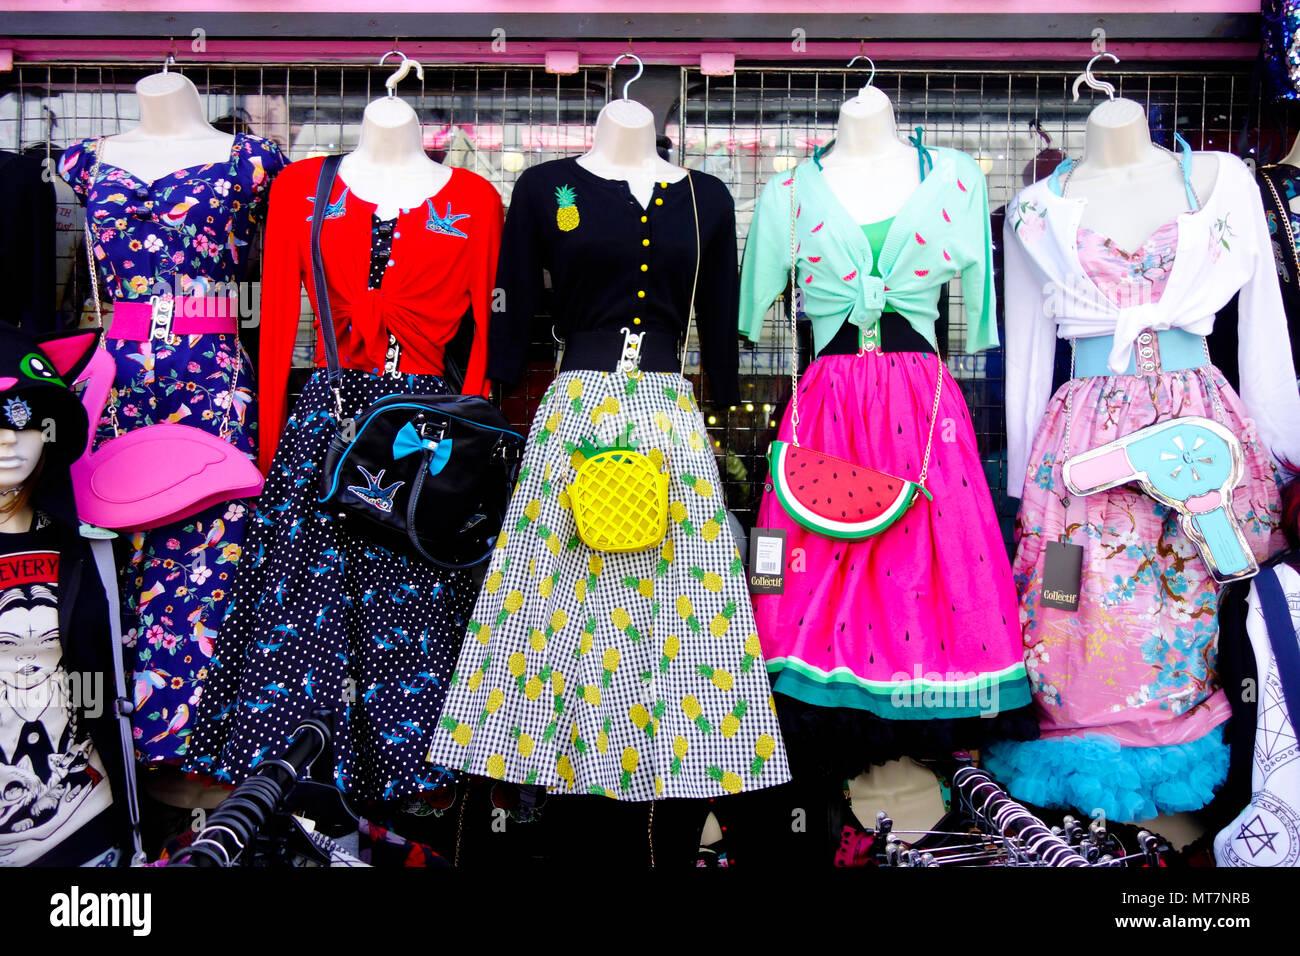 Vintage Wedding Dresses East Sussex: Brighton Shops Stock Photos & Brighton Shops Stock Images